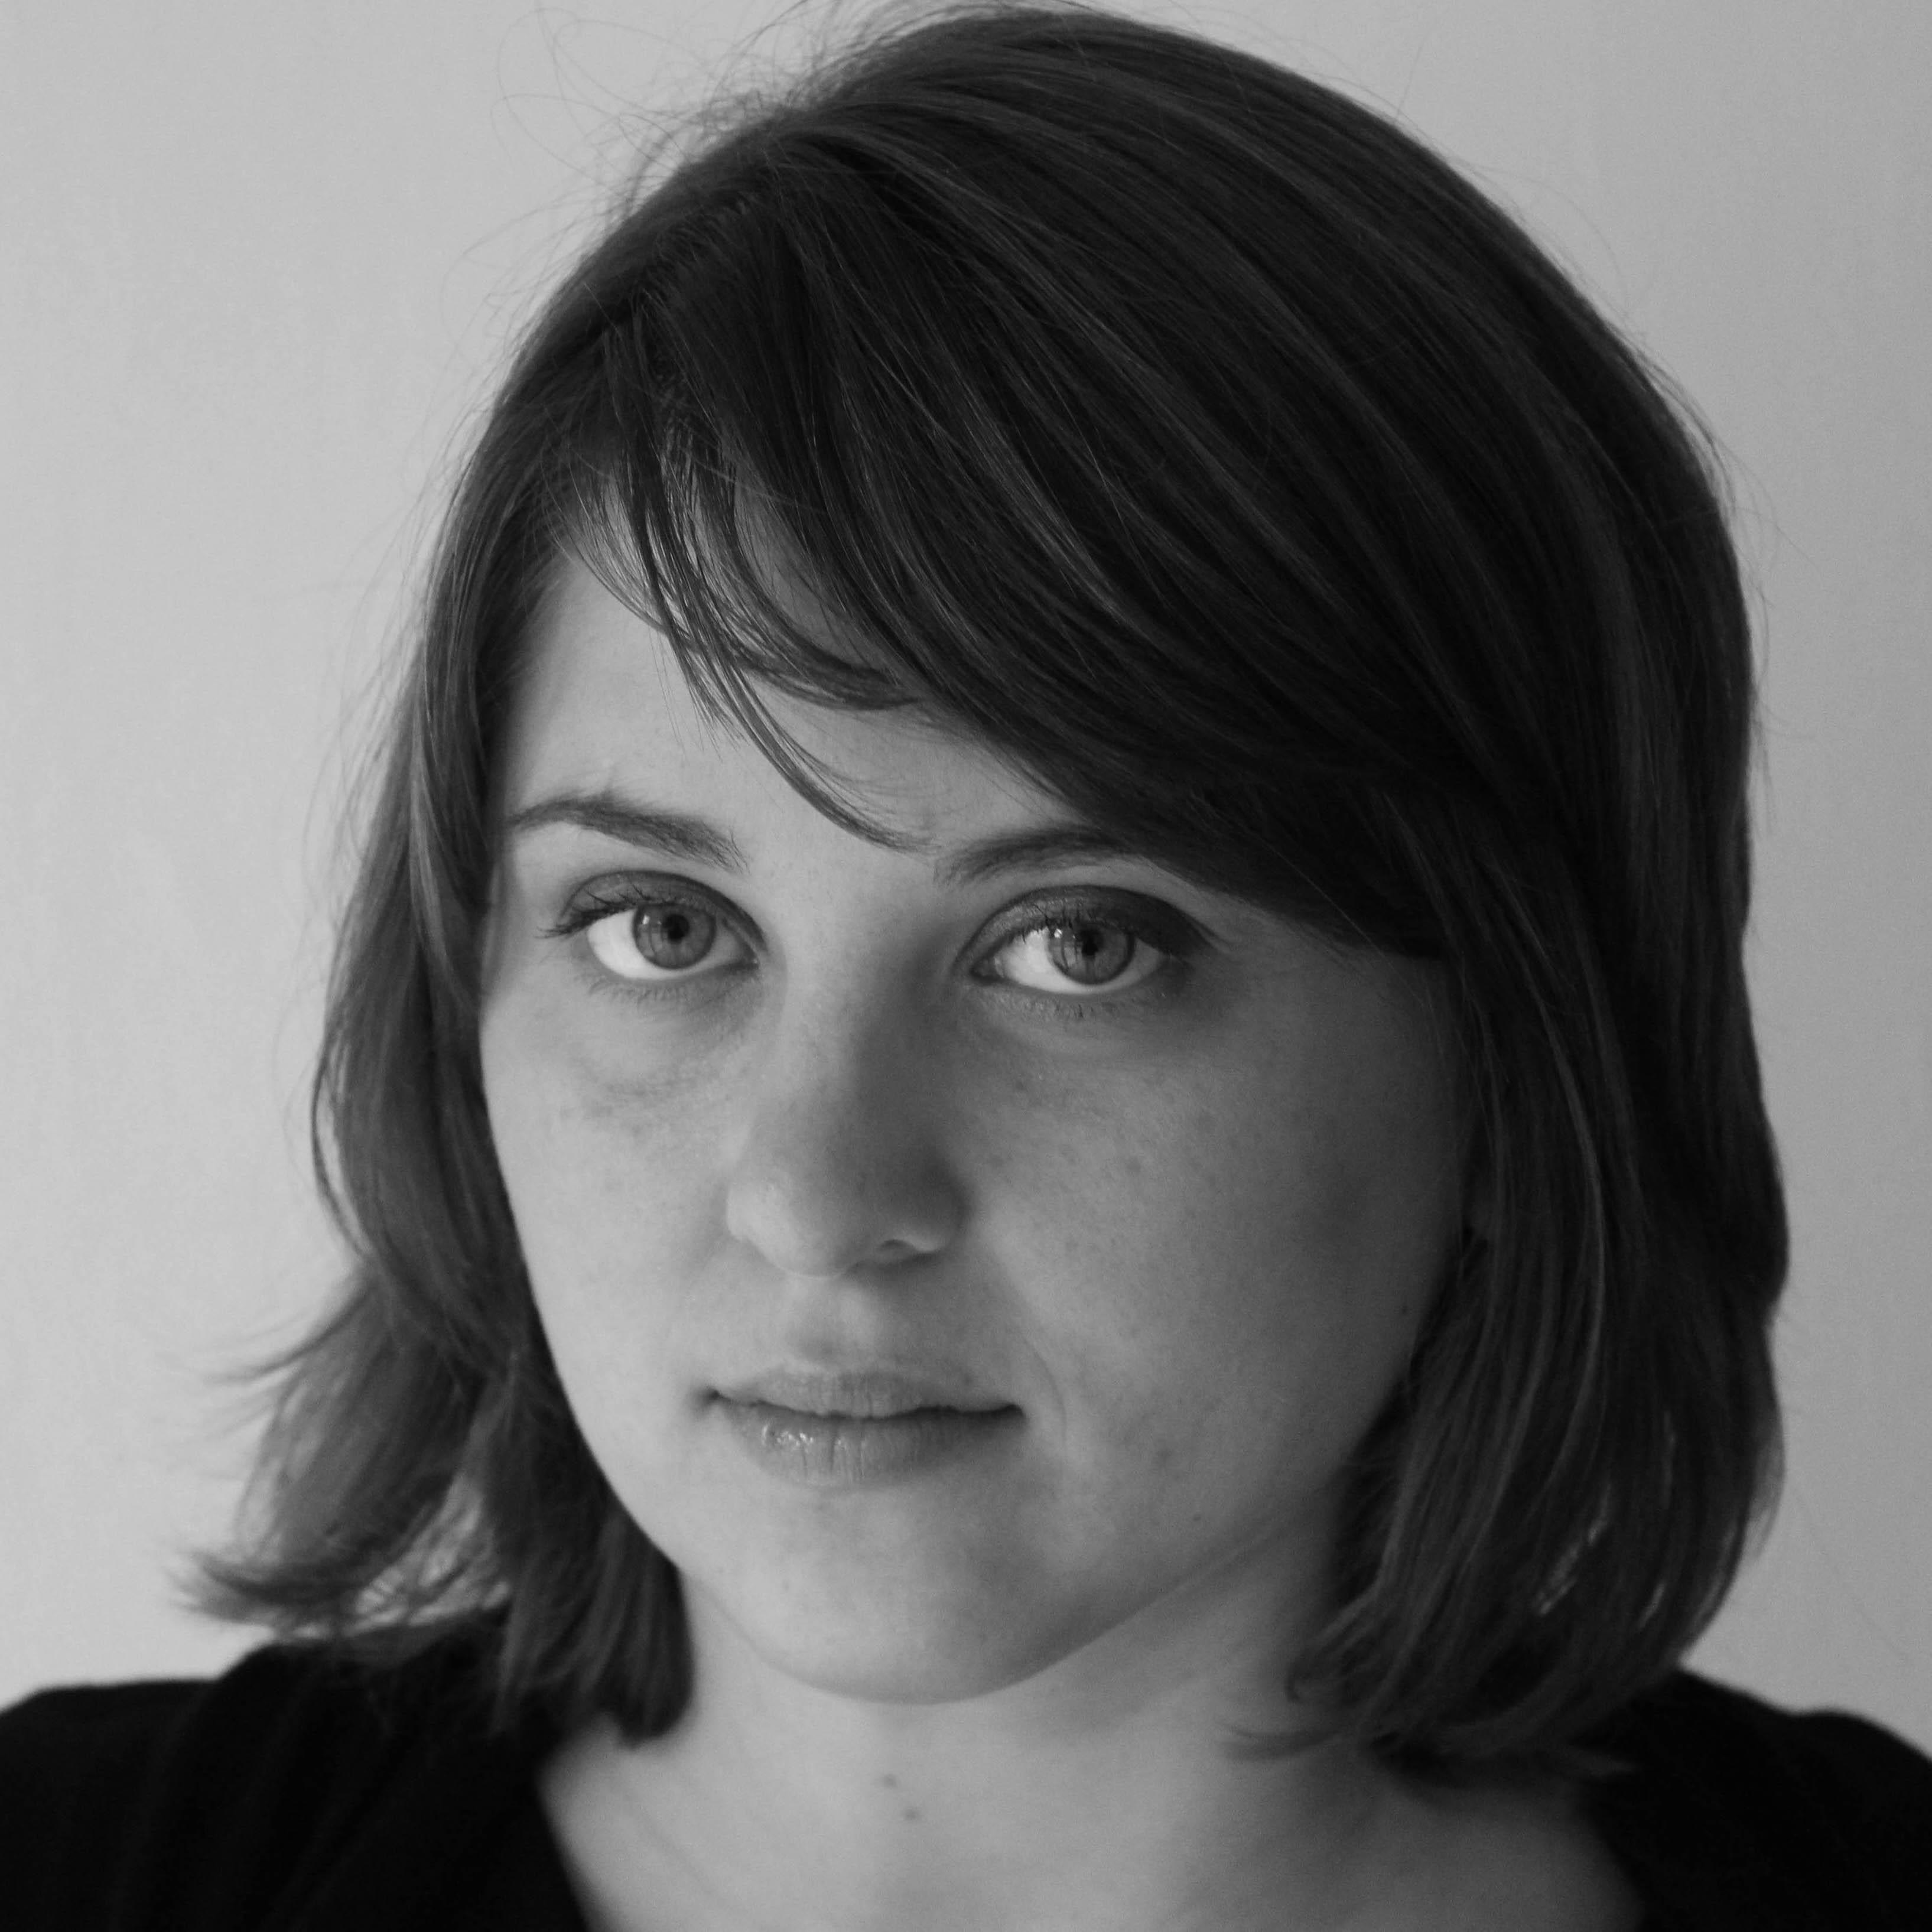 Milena Marin photo